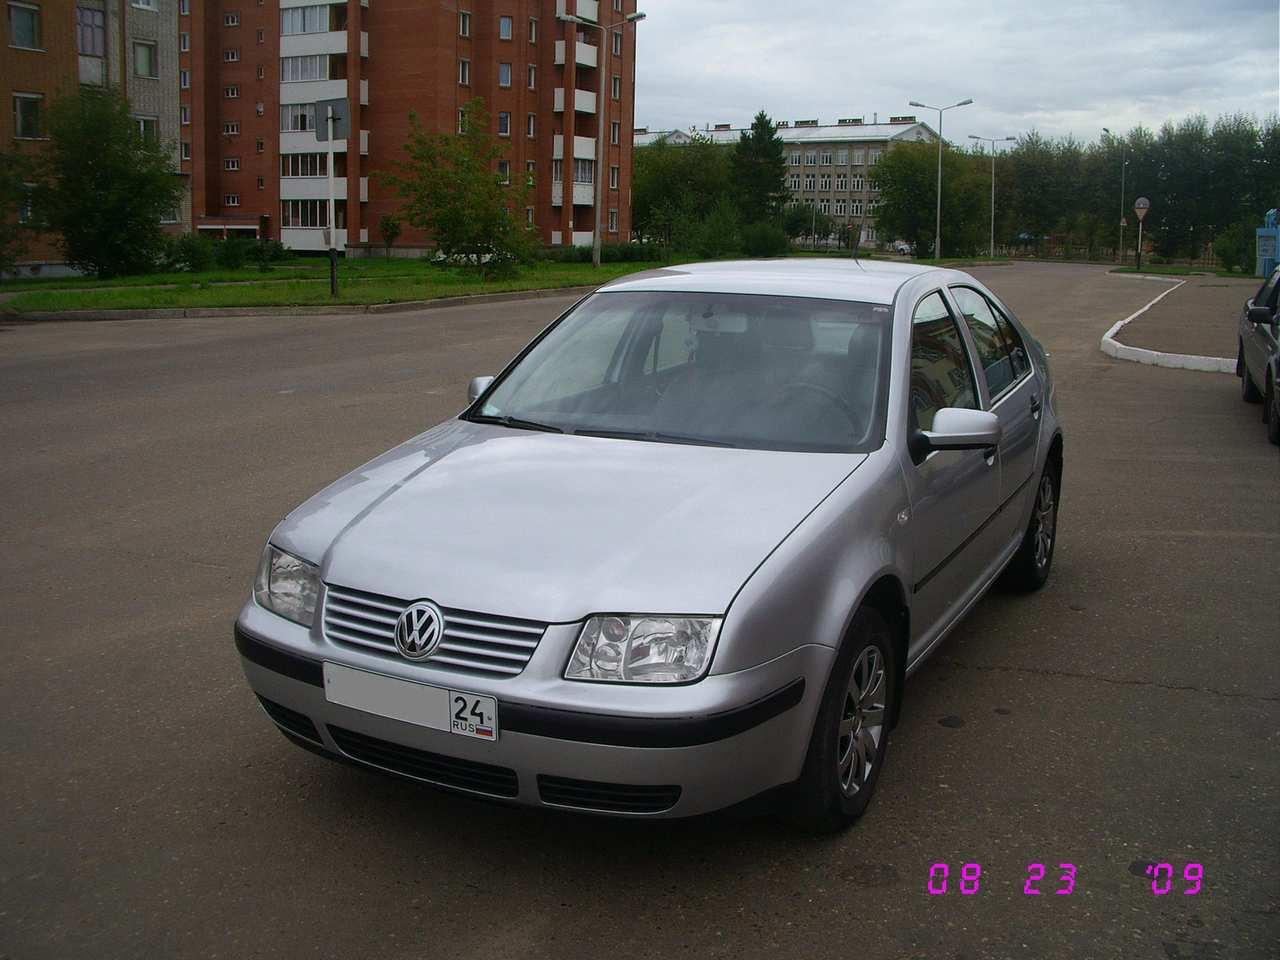 used 2002 volkswagen bora photos 1600cc gasoline ff  bora 2002 #14